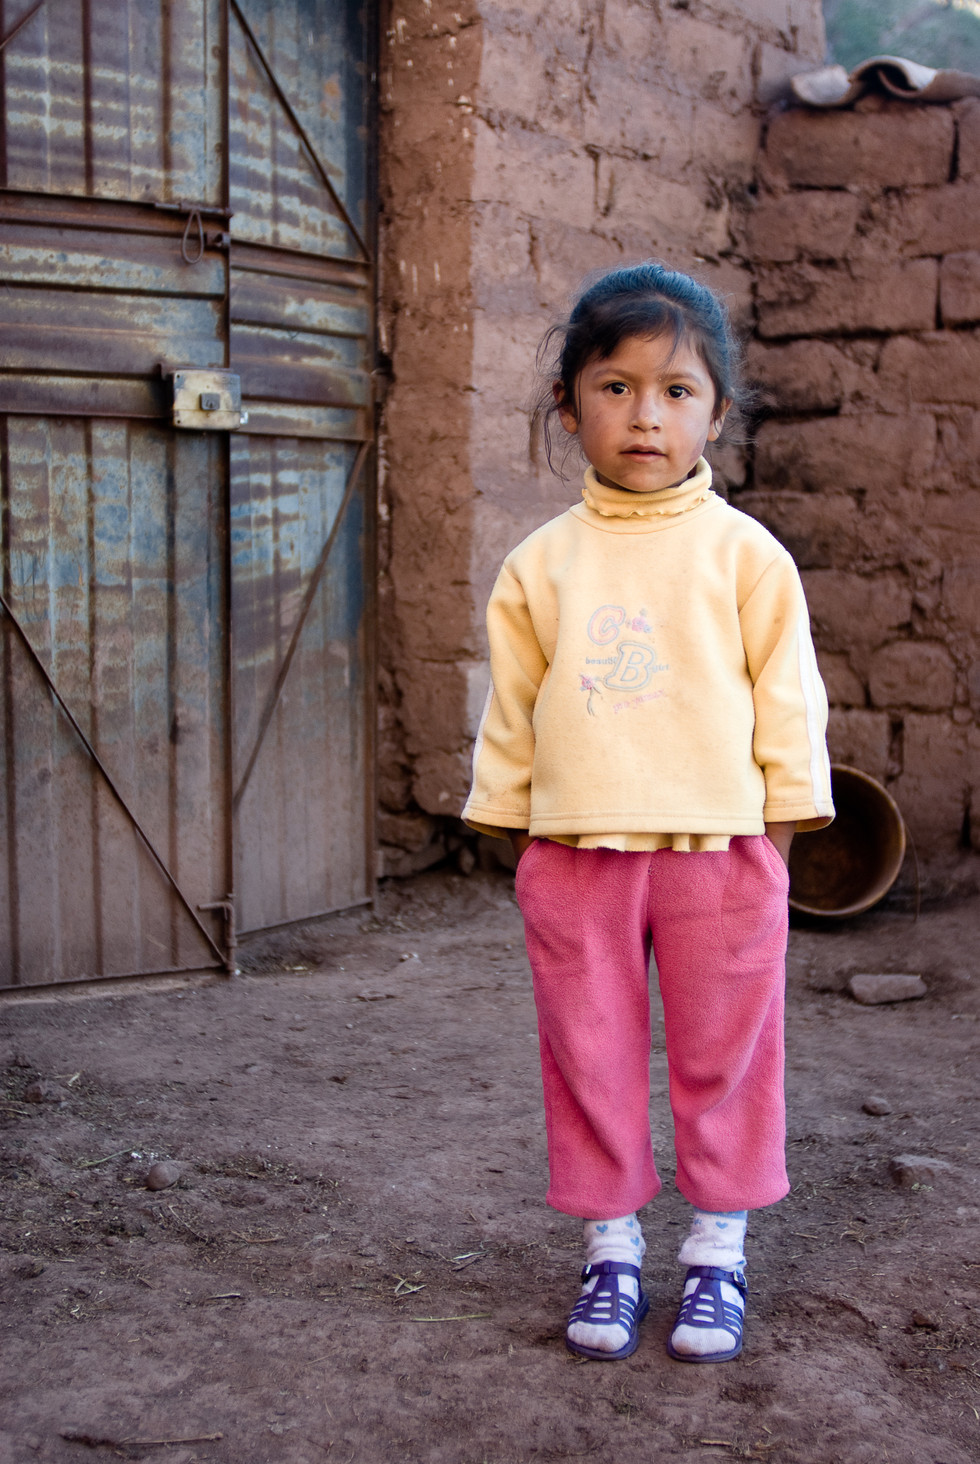 006 Day 6 Cusco - Part 4 - Lucre 047.jpg